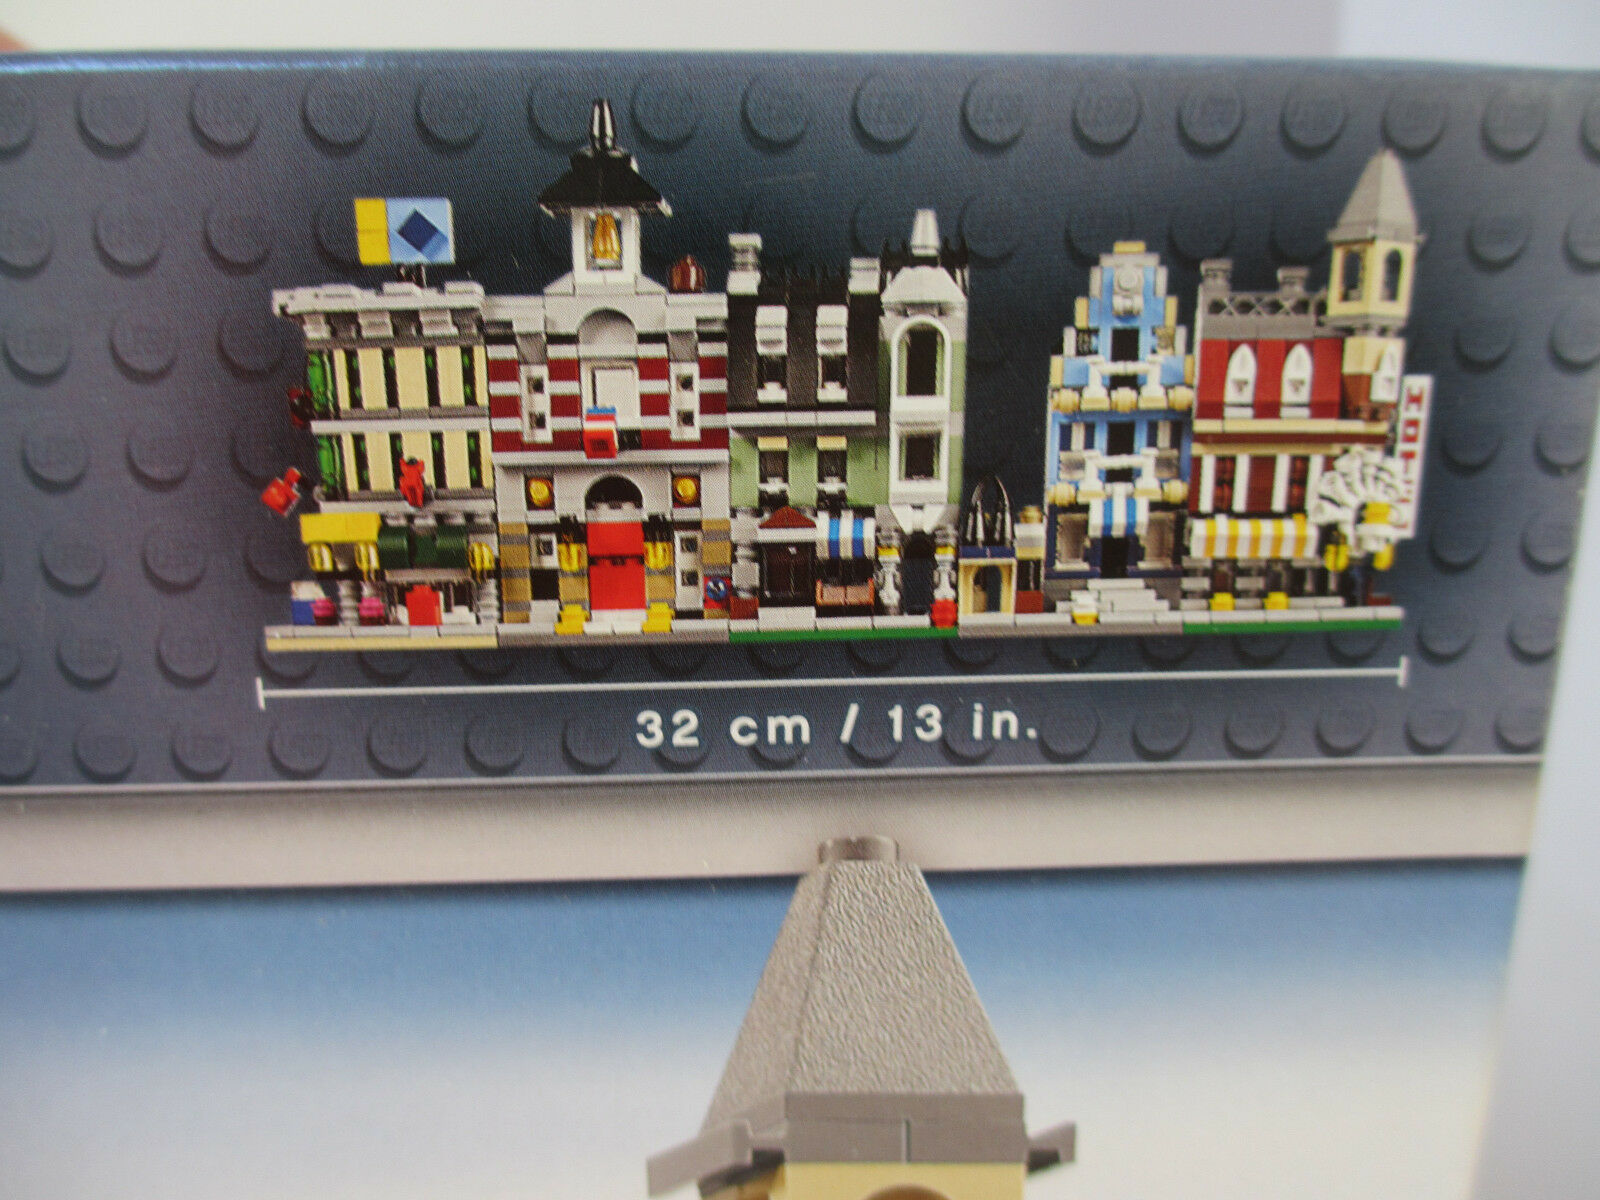 LEGO 10230 Mini Modulars Modulars Modulars - NEW in SEALED BOX -  RETIRED 594bff